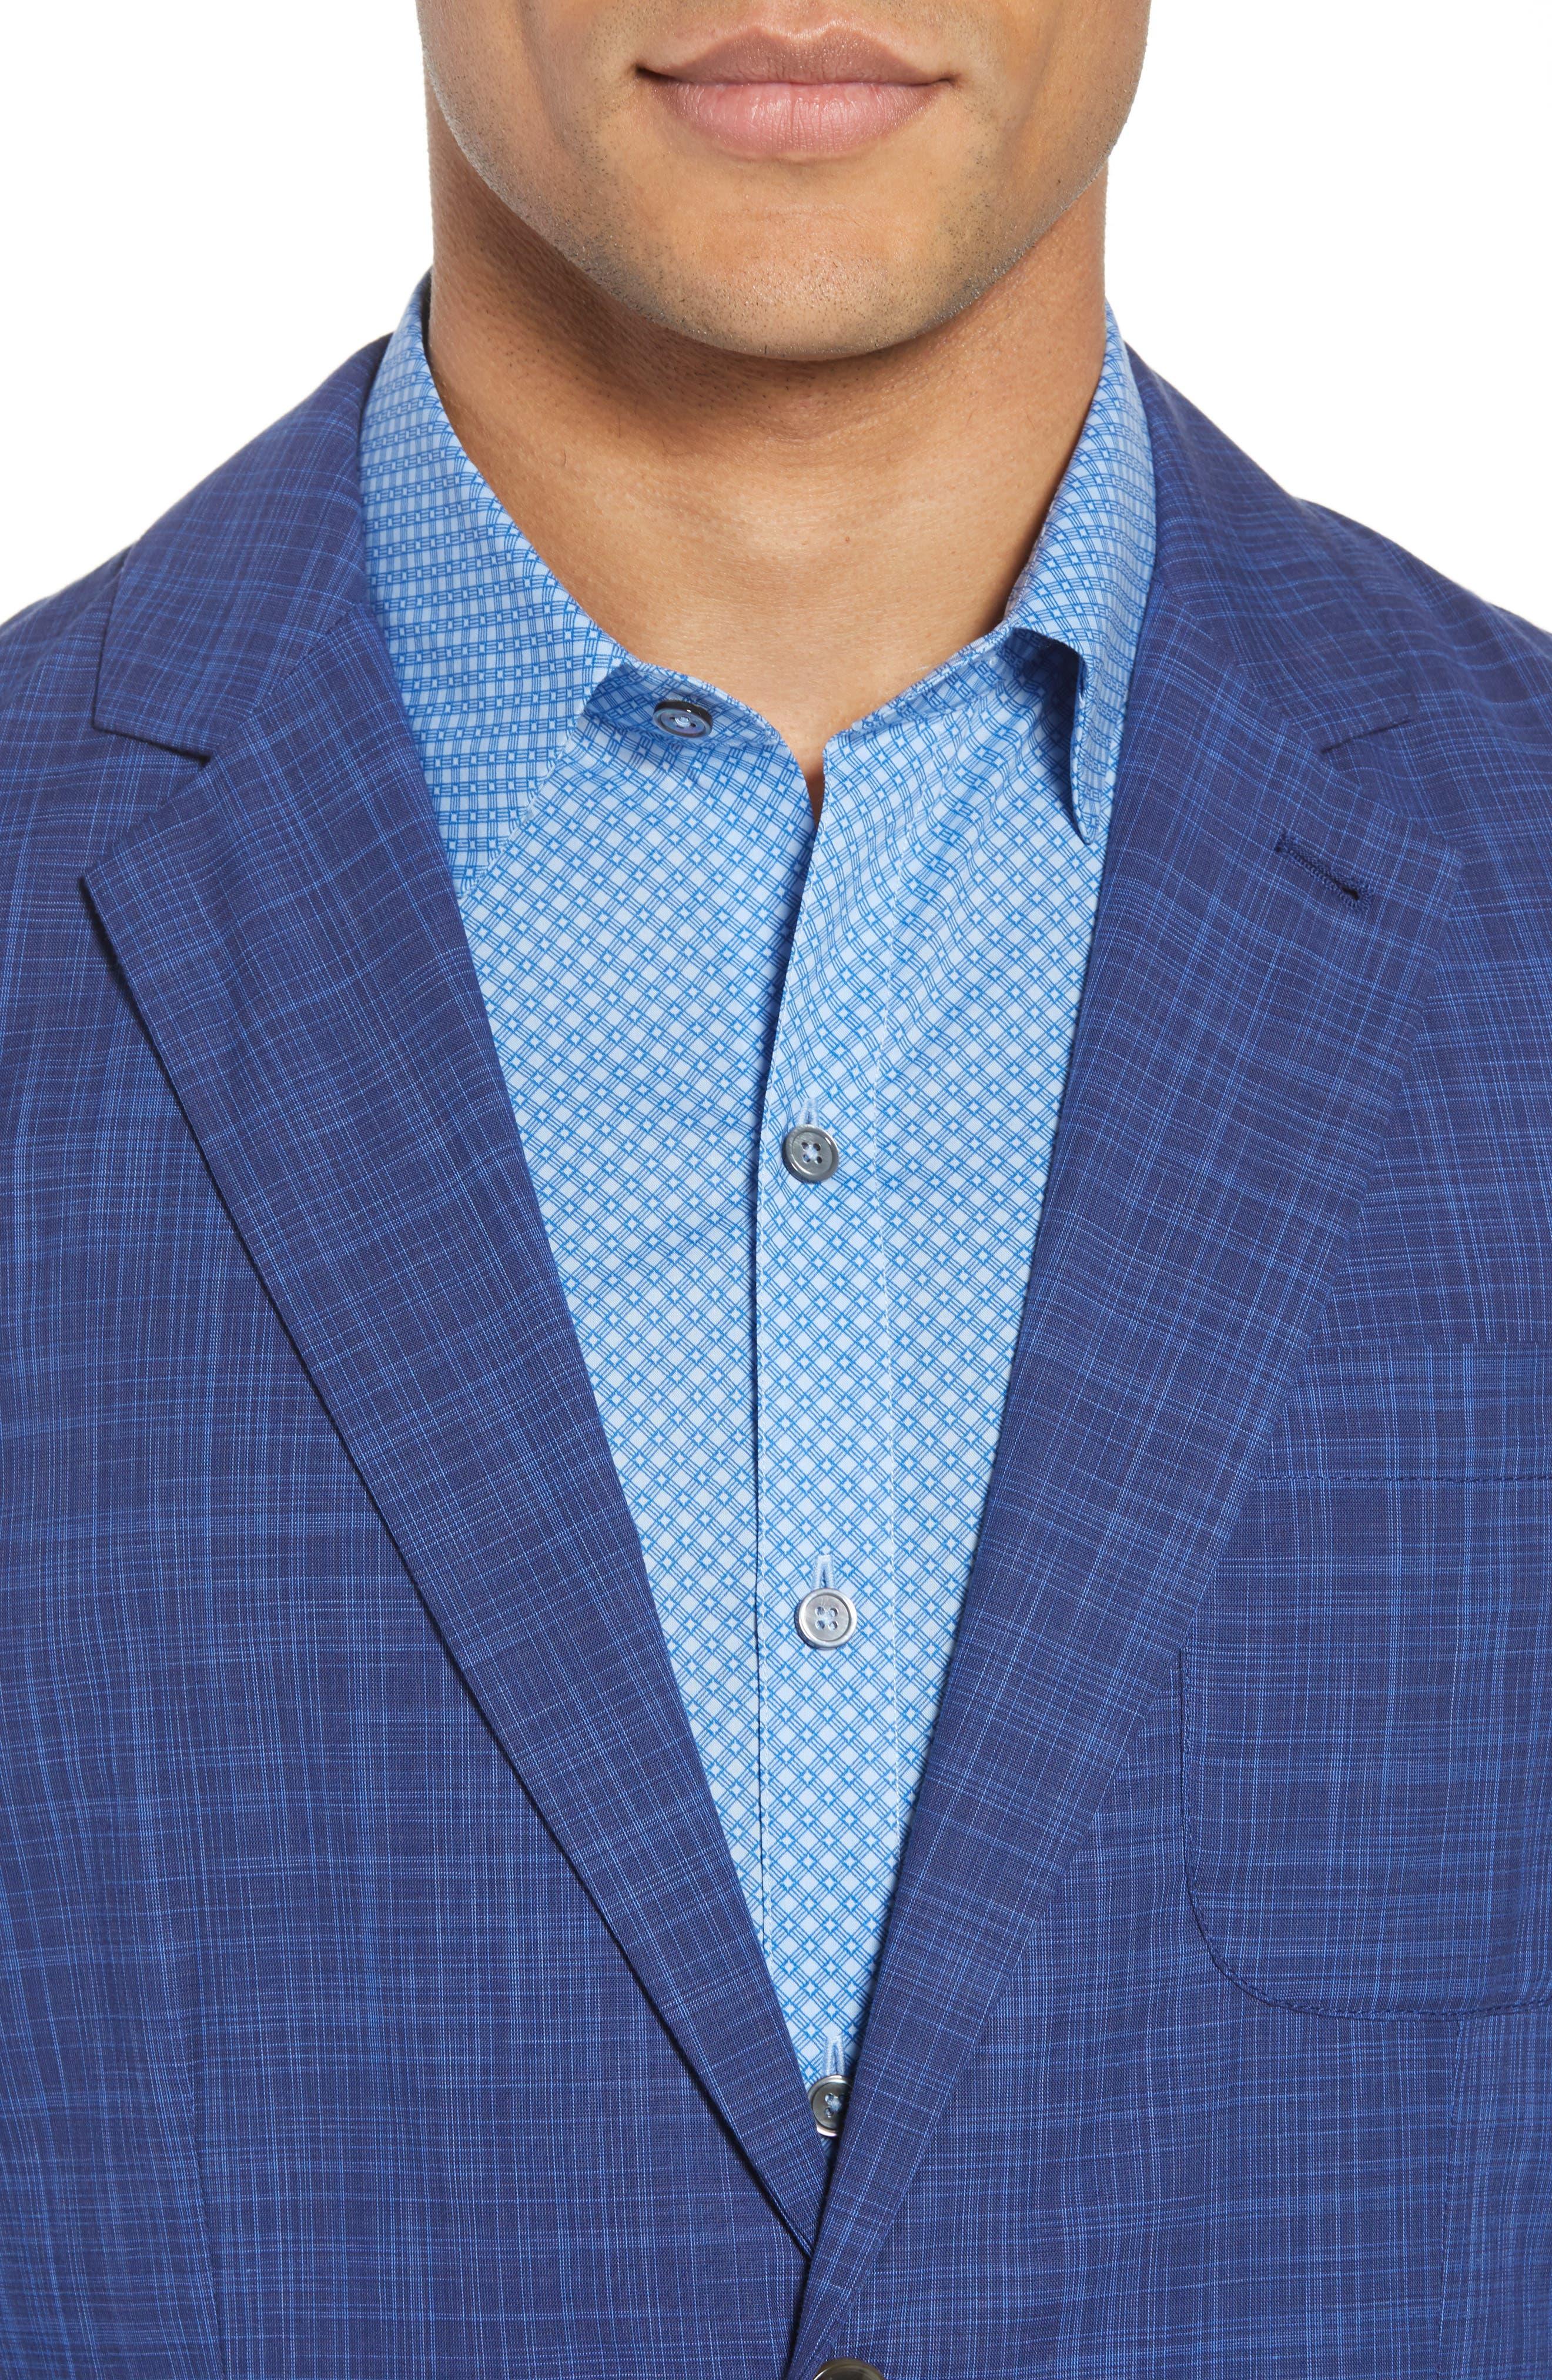 Belmont Regular Fit Sport Coat,                             Alternate thumbnail 4, color,                             Blue